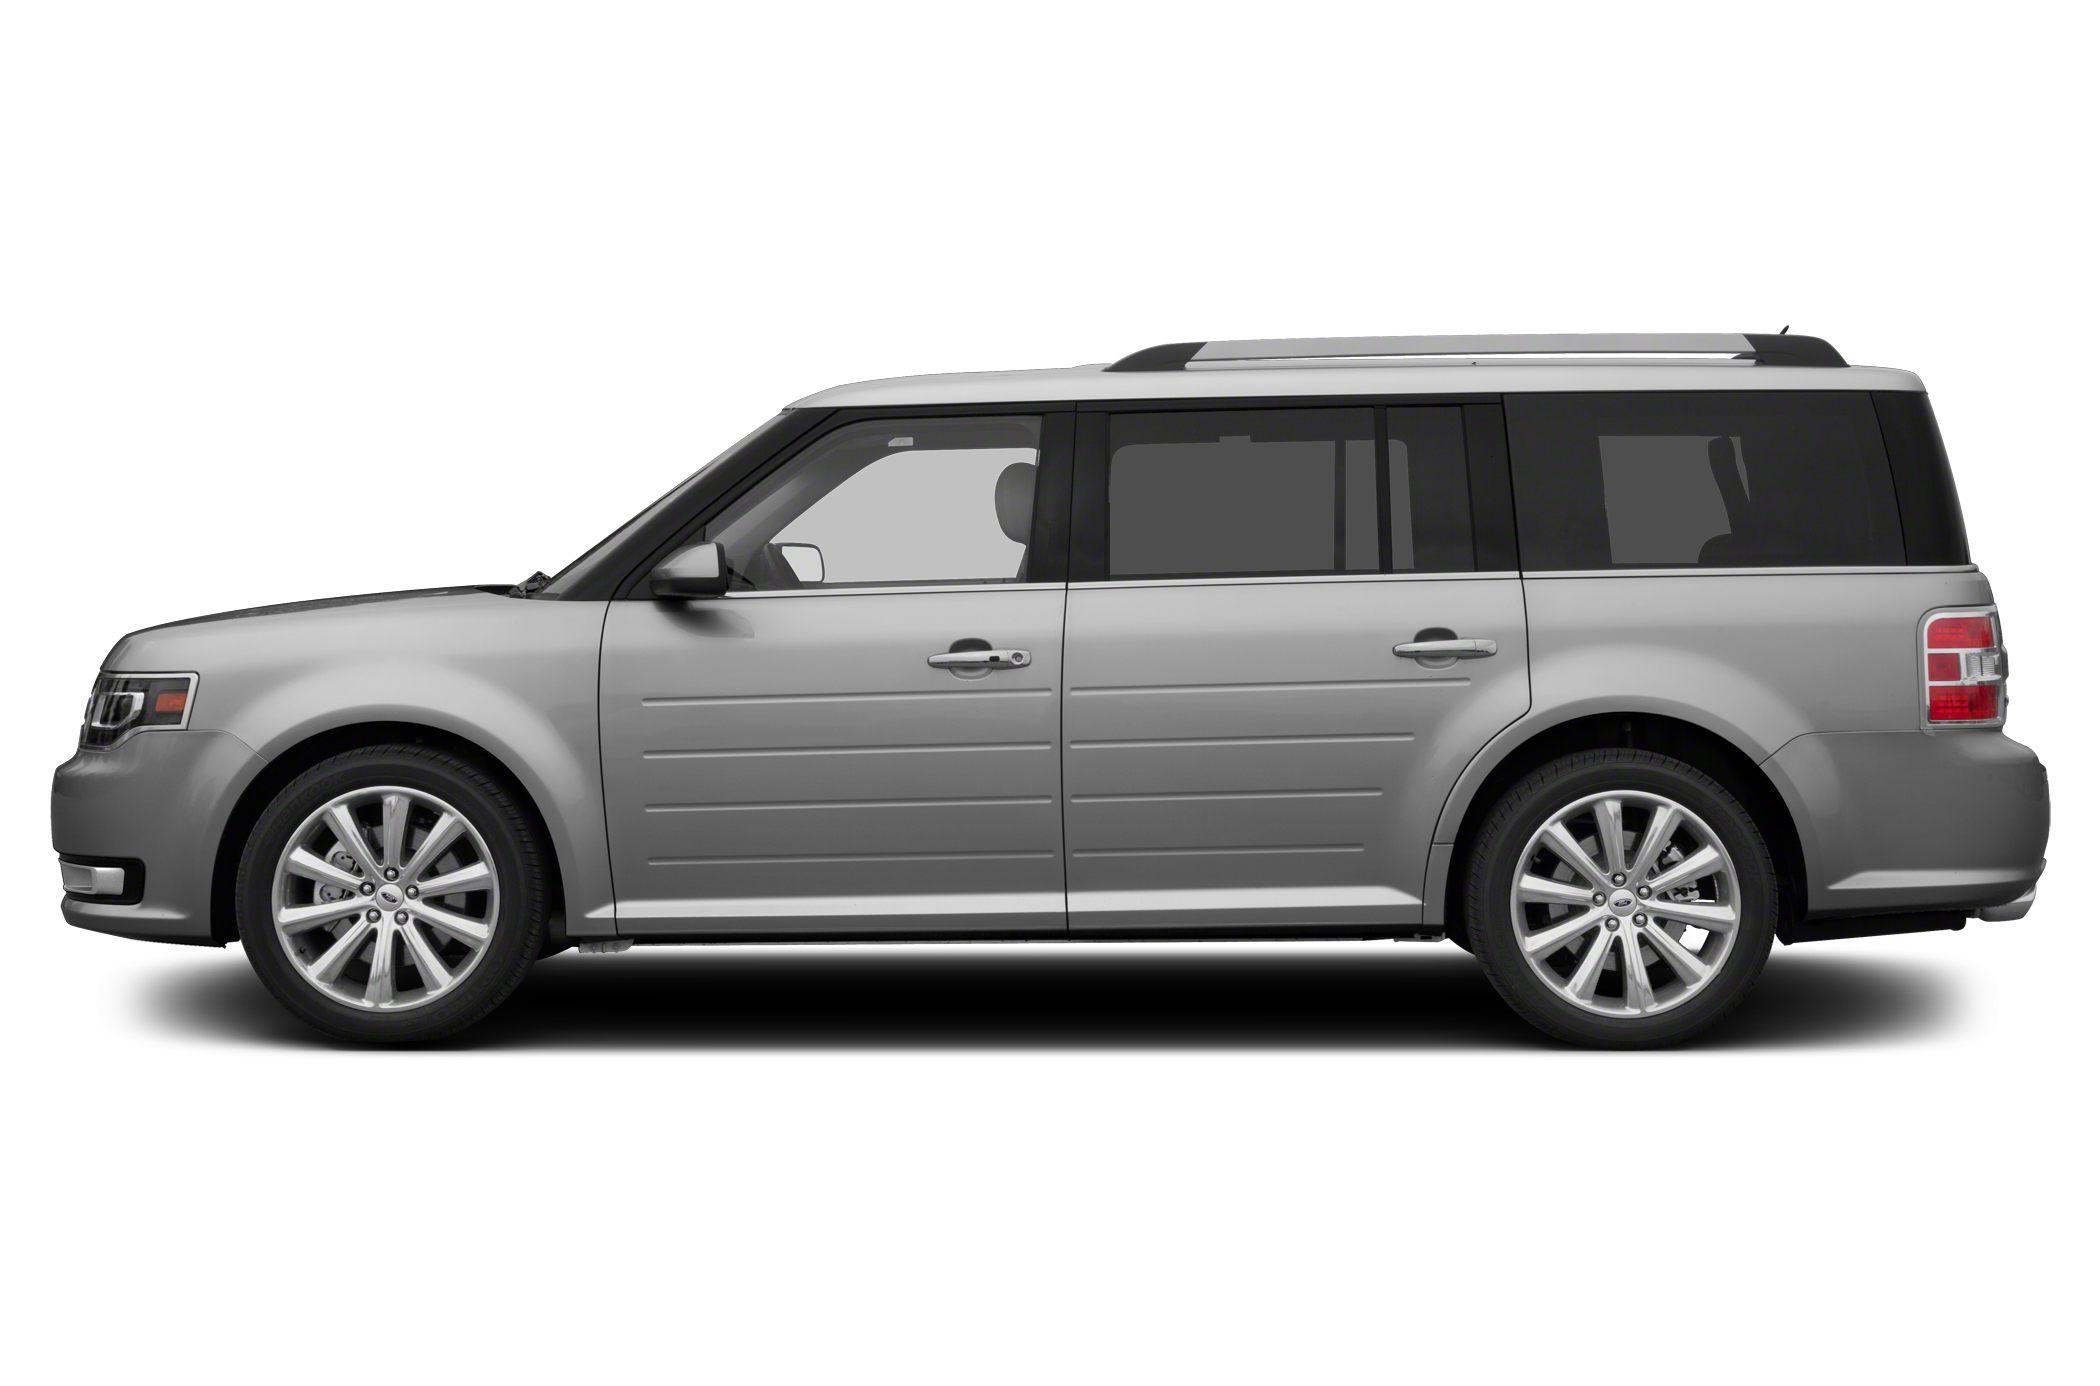 used 2014 ford flex for sale carmax. Black Bedroom Furniture Sets. Home Design Ideas